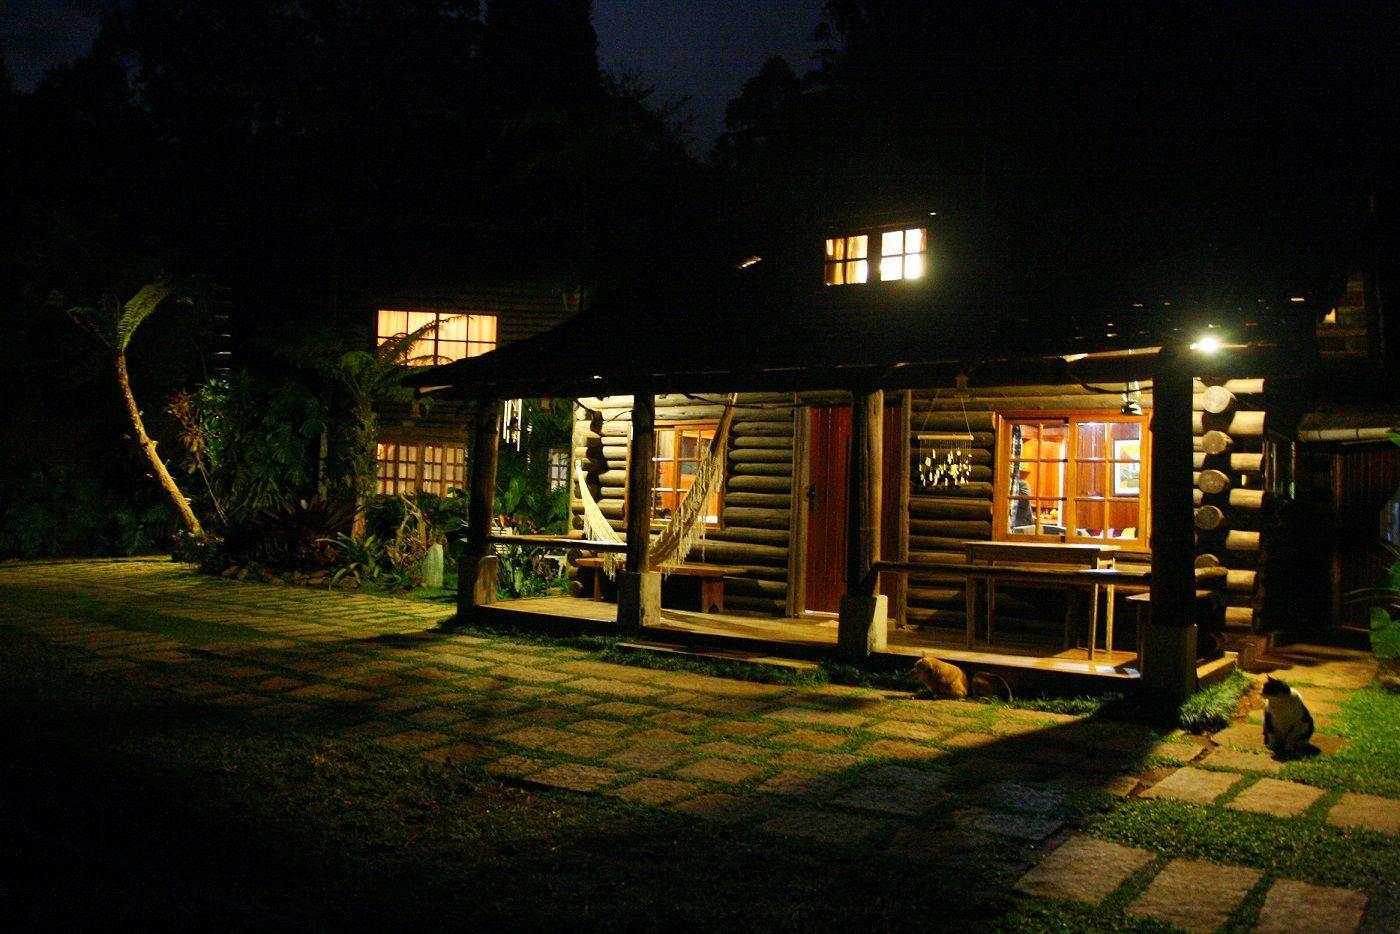 Itororo Ecolodge by night